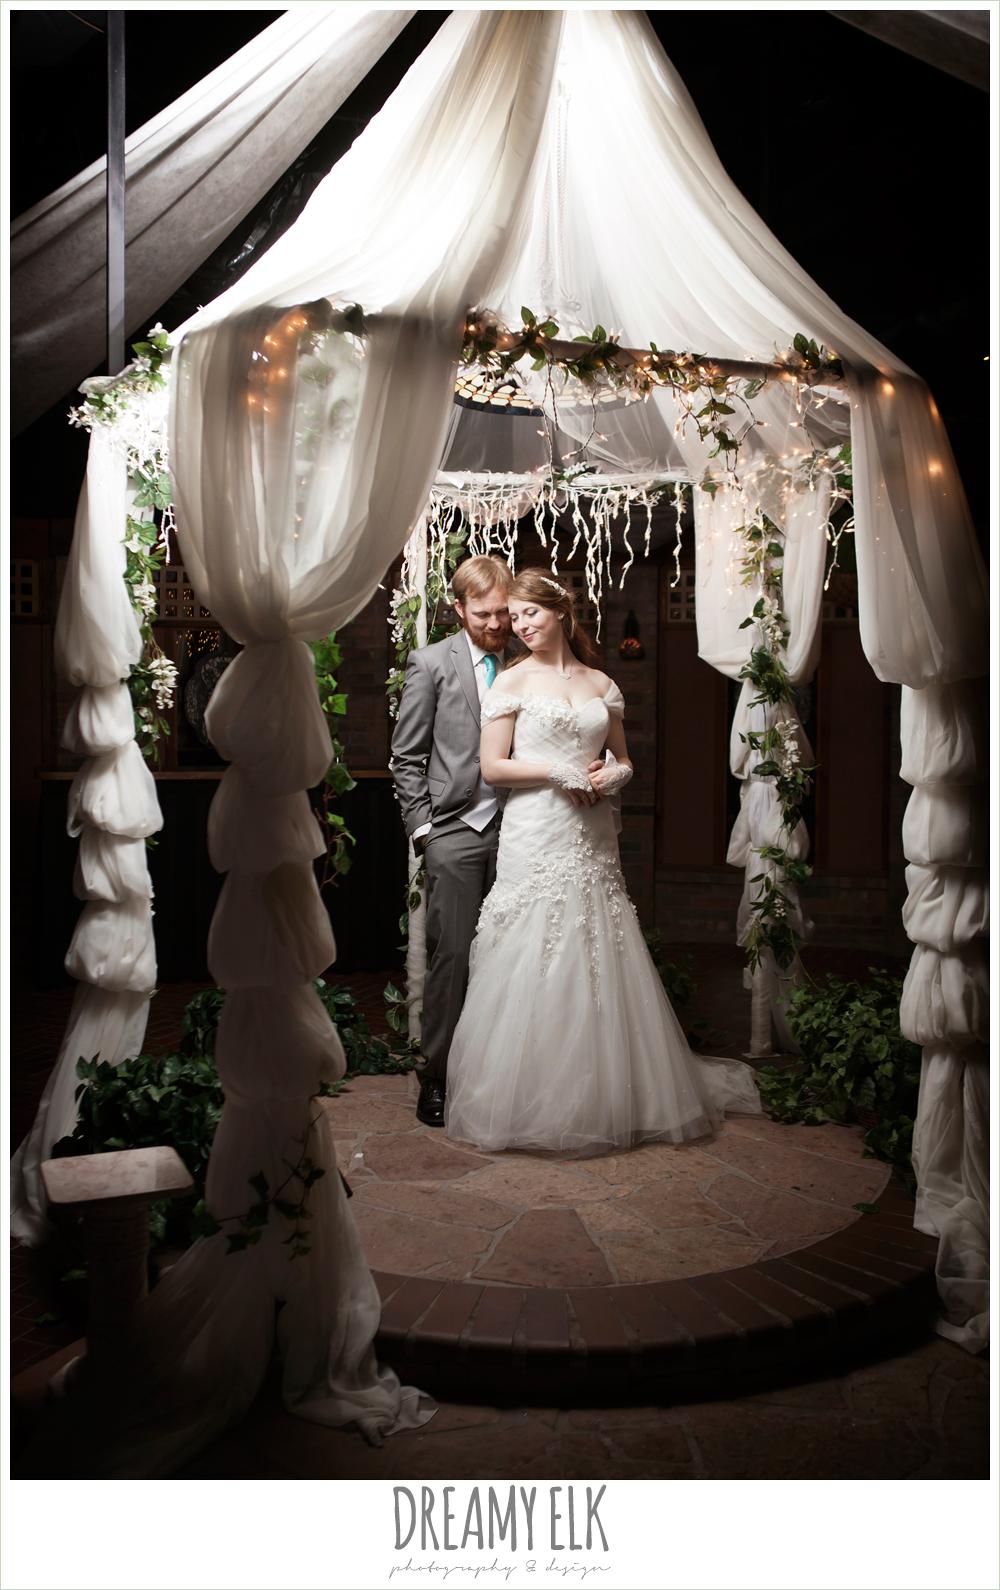 bride and groom under a gazebo, le jardin winter wedding {dreamy elk photography and design}